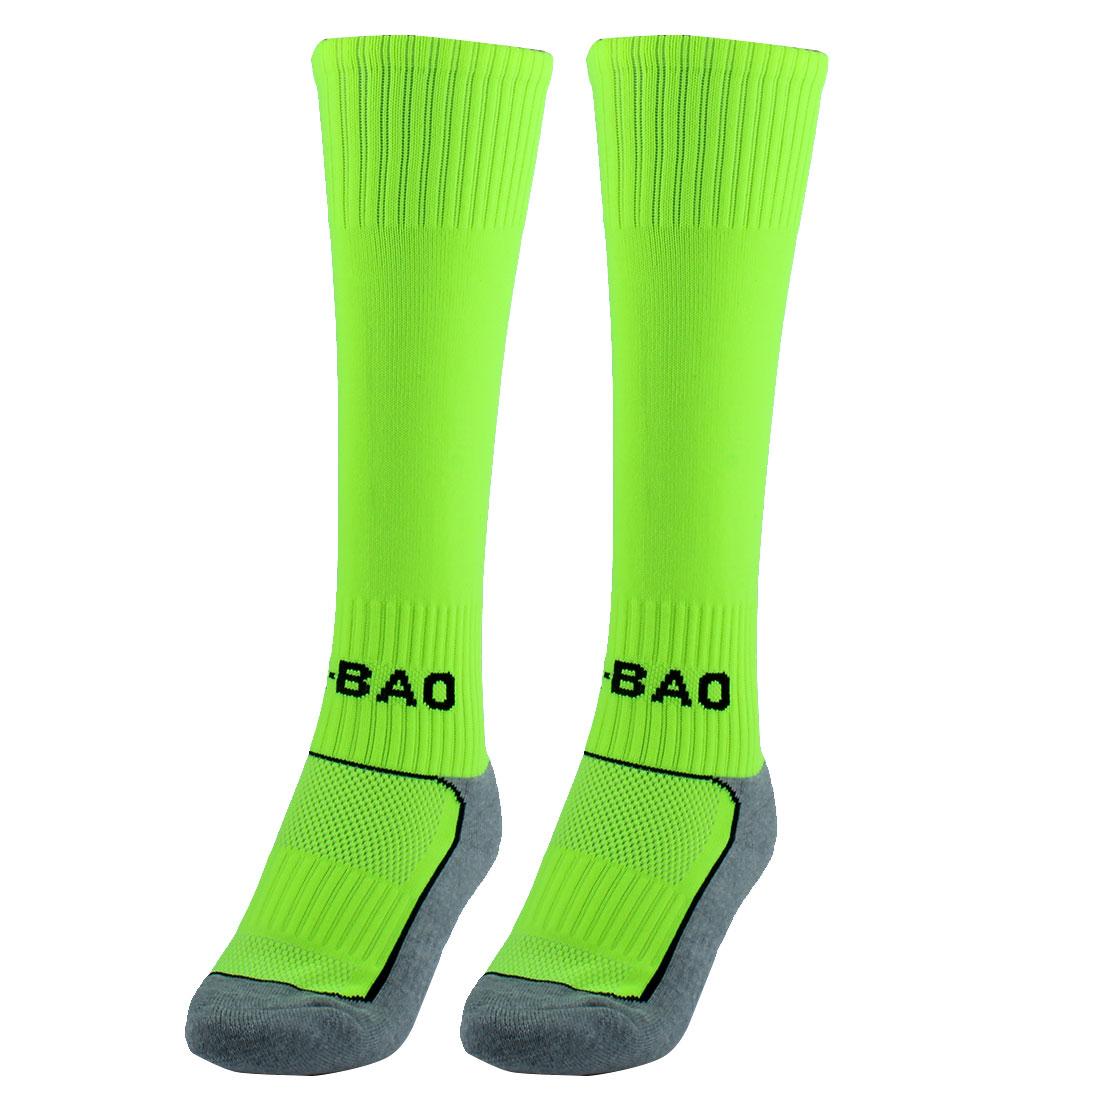 R-BAO Authorized Outdoor Soccer Football Long Socks Fluorescent Green Pair